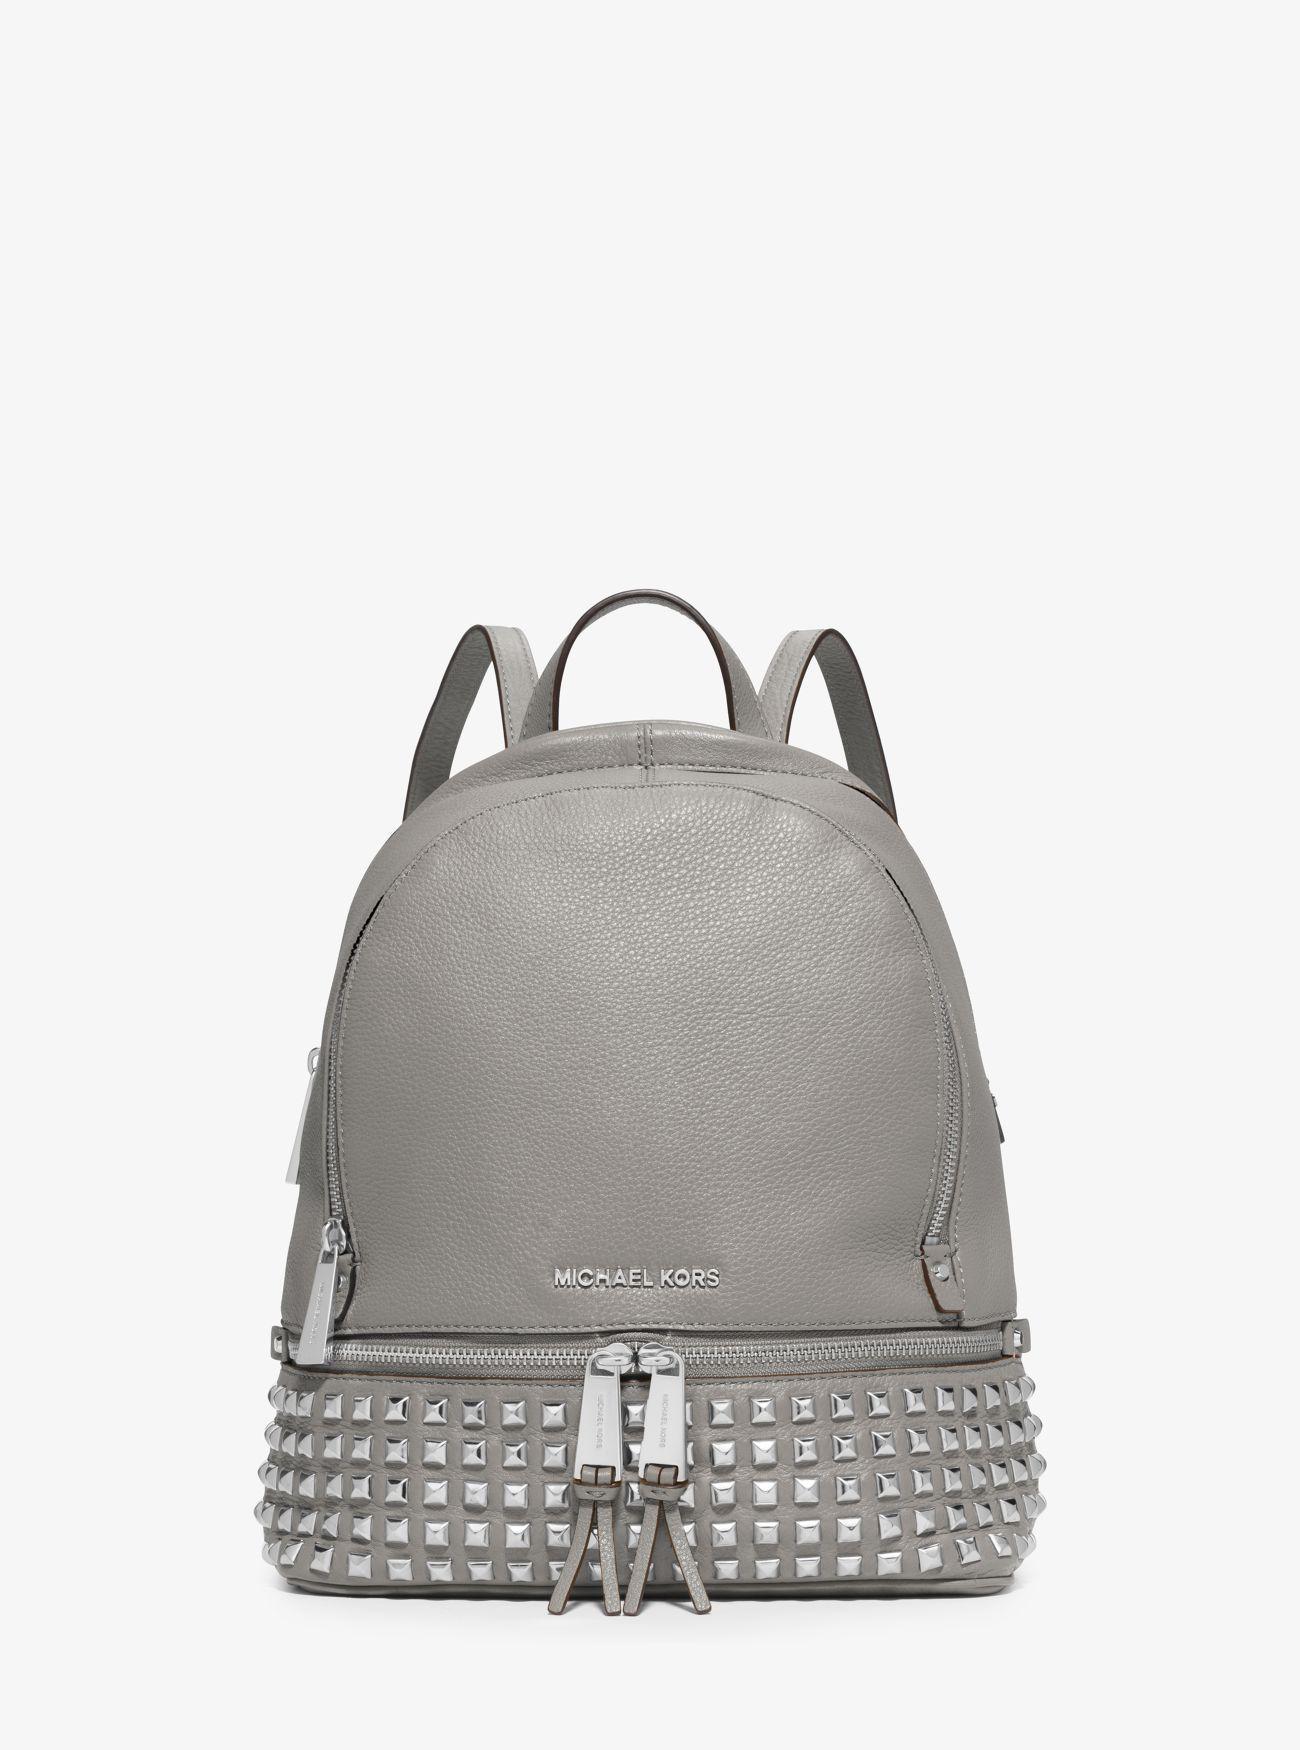 9dac9a68279b Michael Kors - White Rhea Medium Studded Pebbled Leather Backpack - Lyst.  View fullscreen